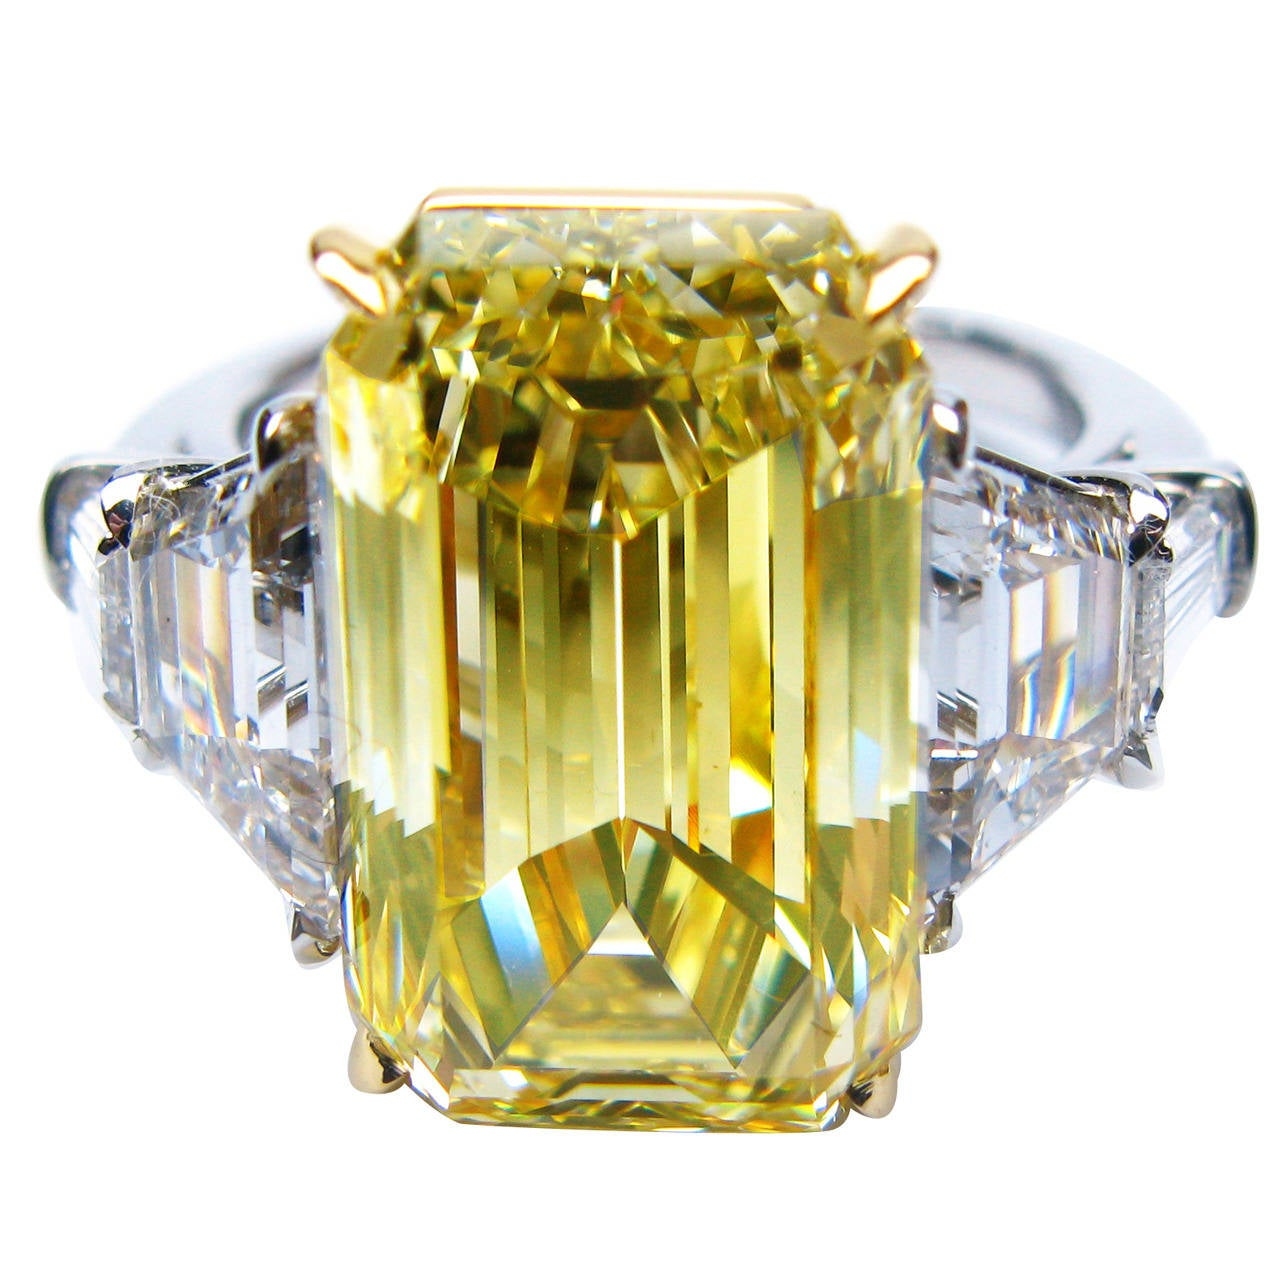 825 Carat Fancy Yellow Emerald Cut Diamond Gold Platinum Engagement Ring 1